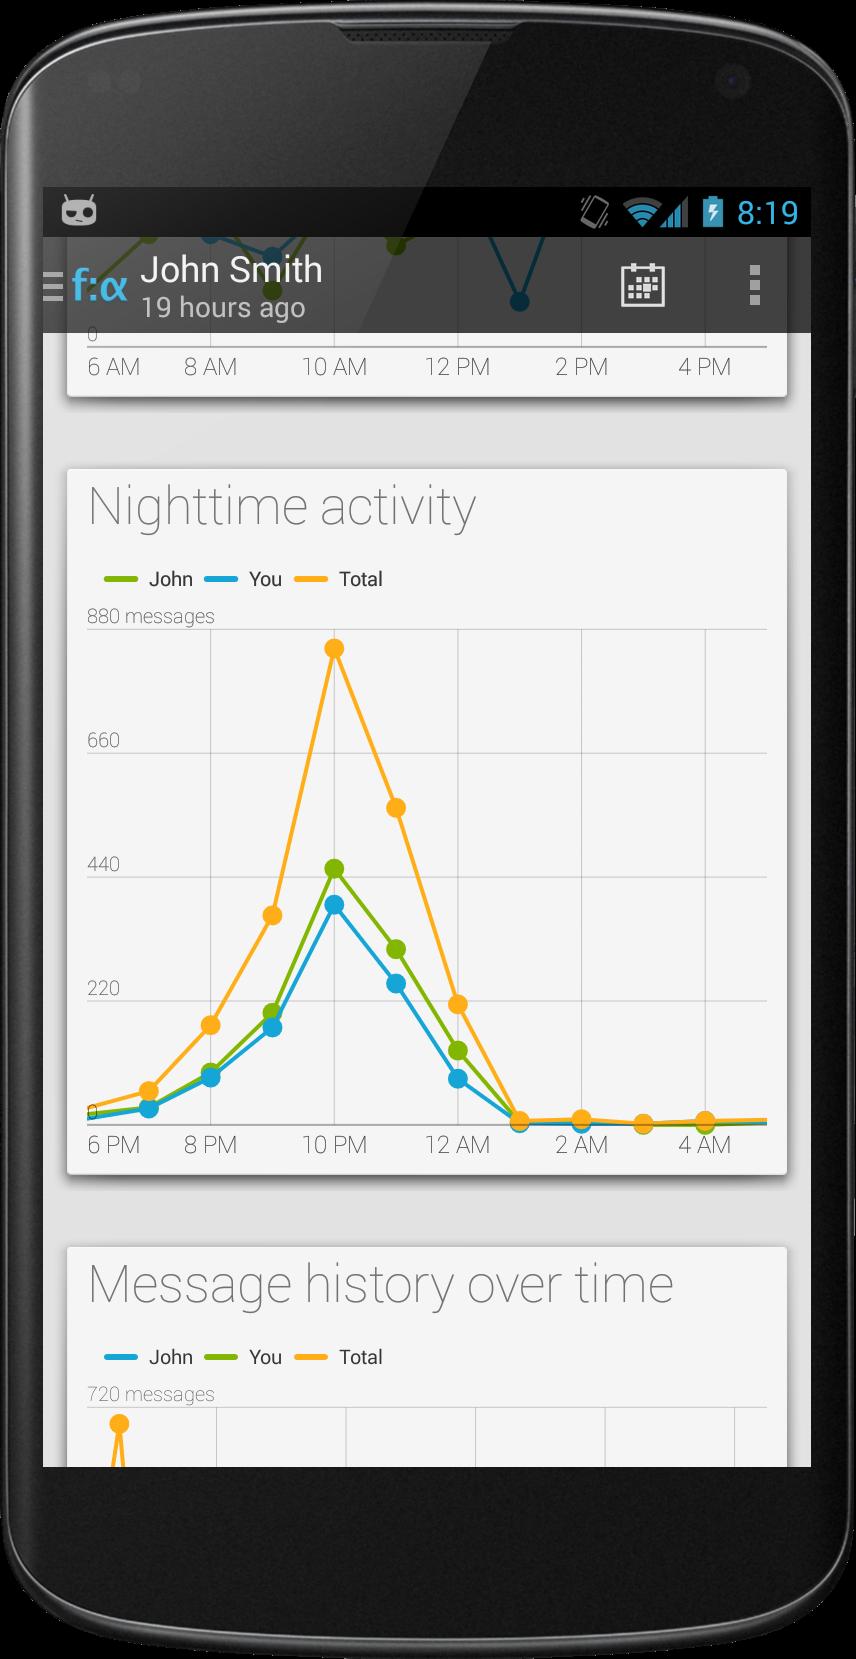 Activity at night